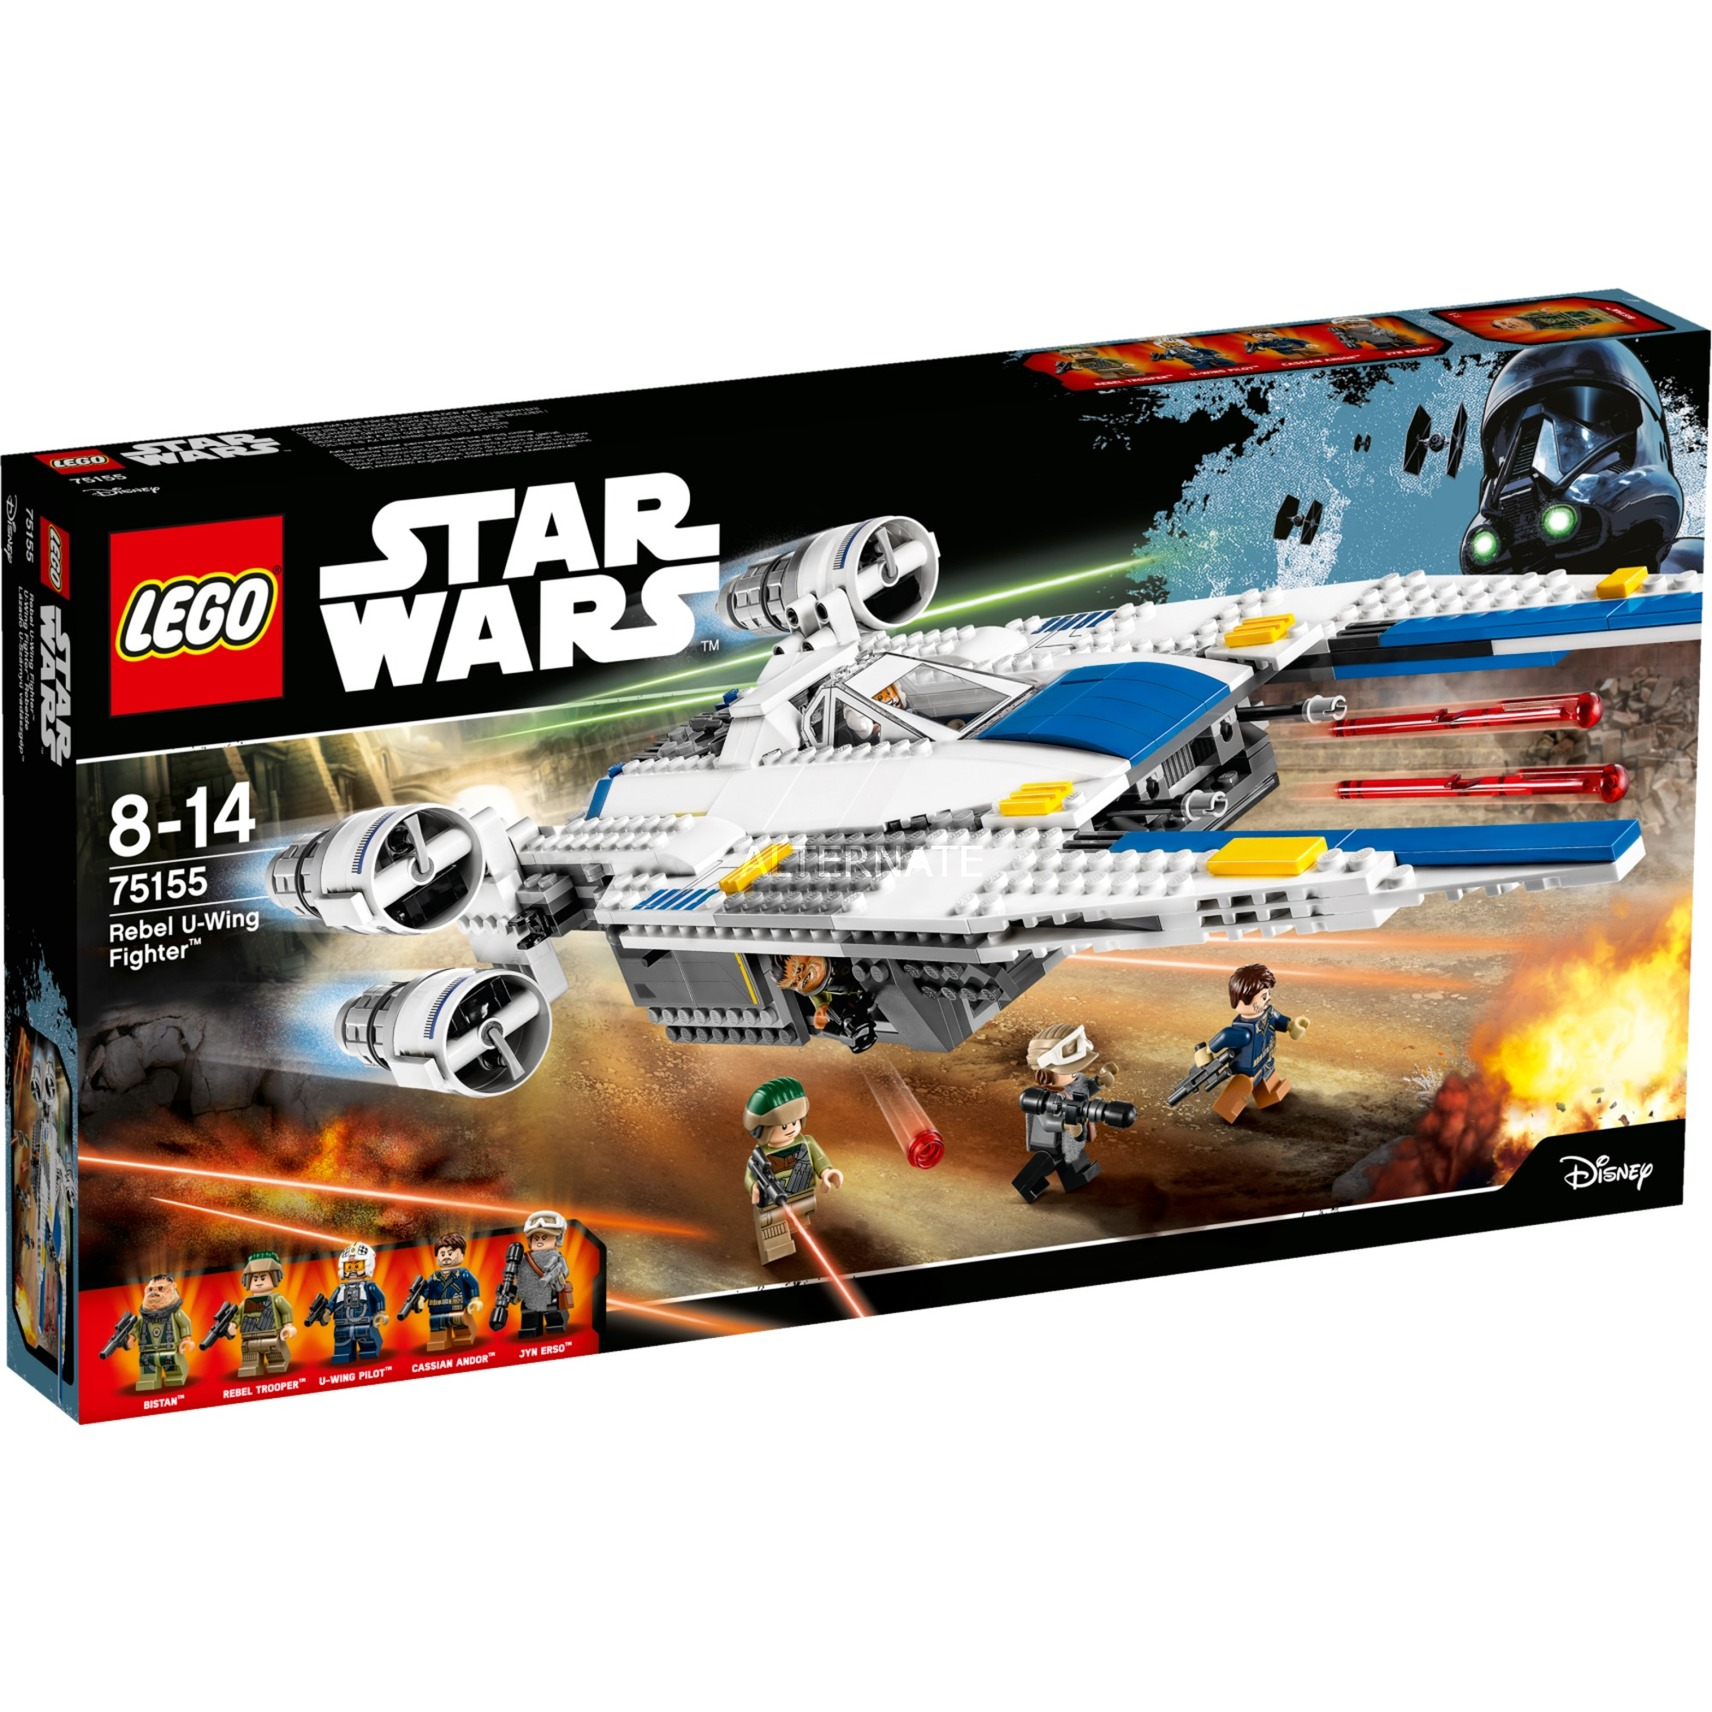 Star Wars - Rebel U-Wing Fighter, Jouets de construction